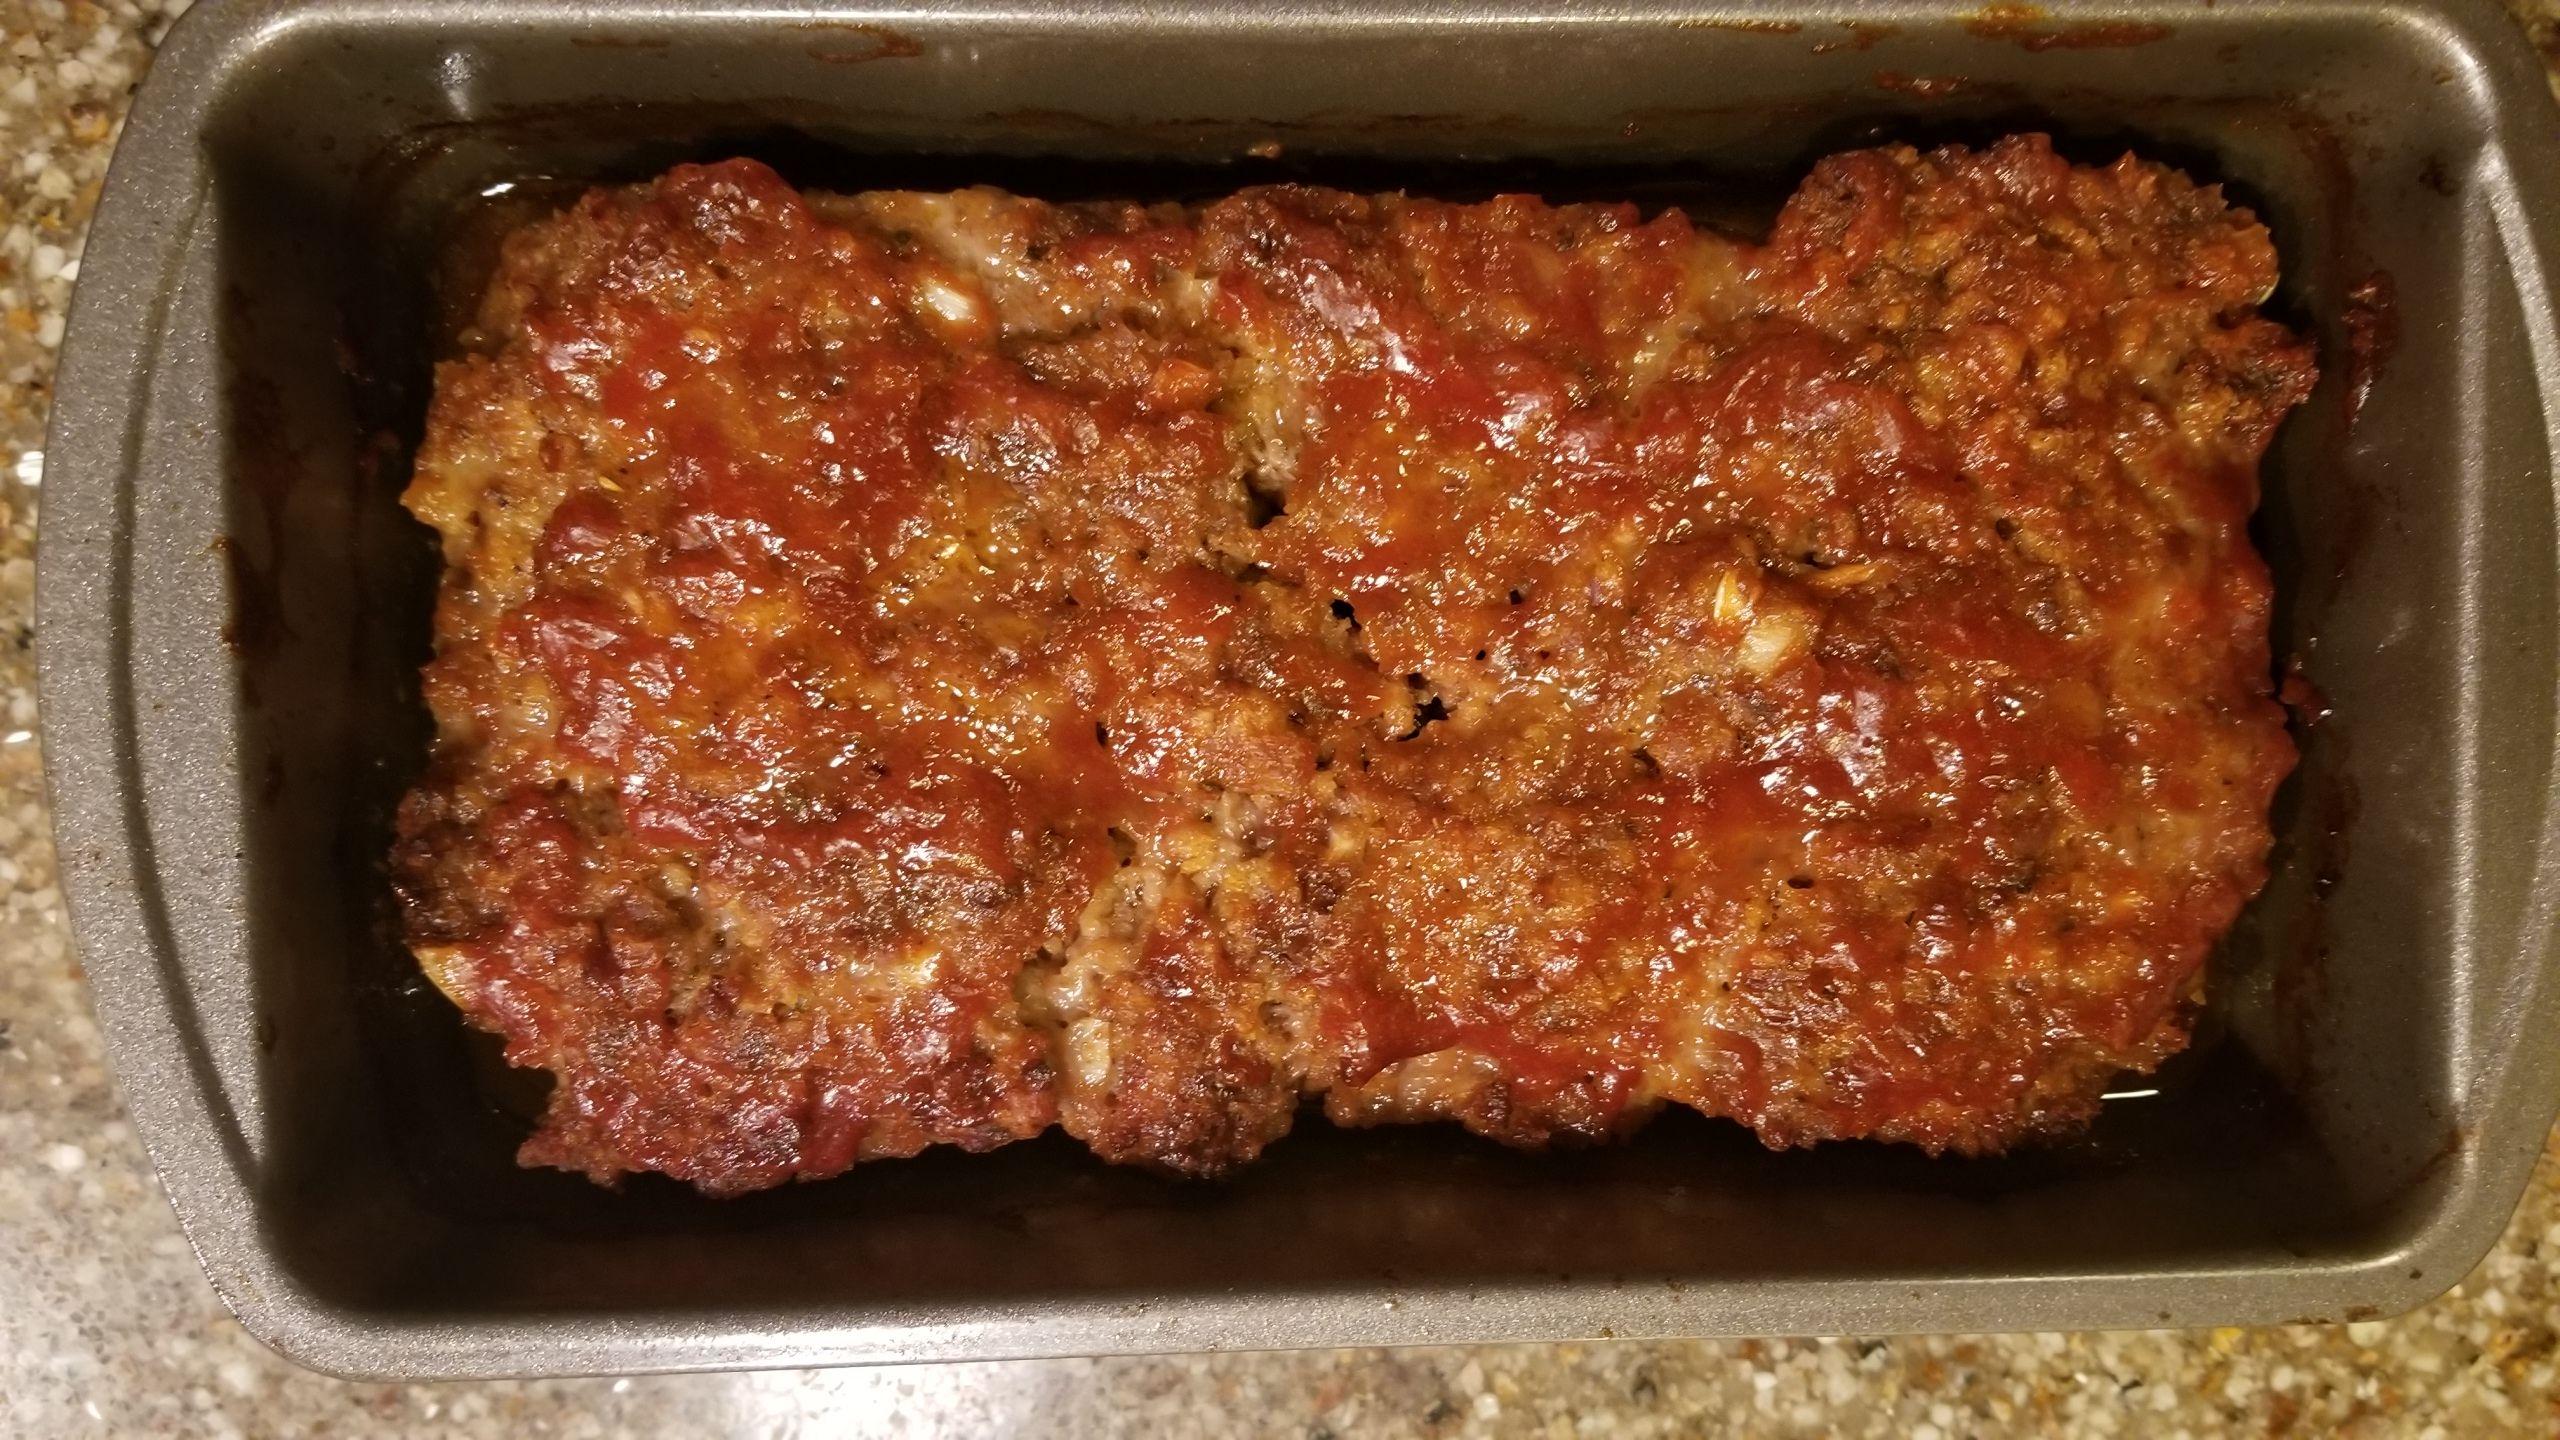 Img Sndimg Com Food Image Upload Fl Progressive C